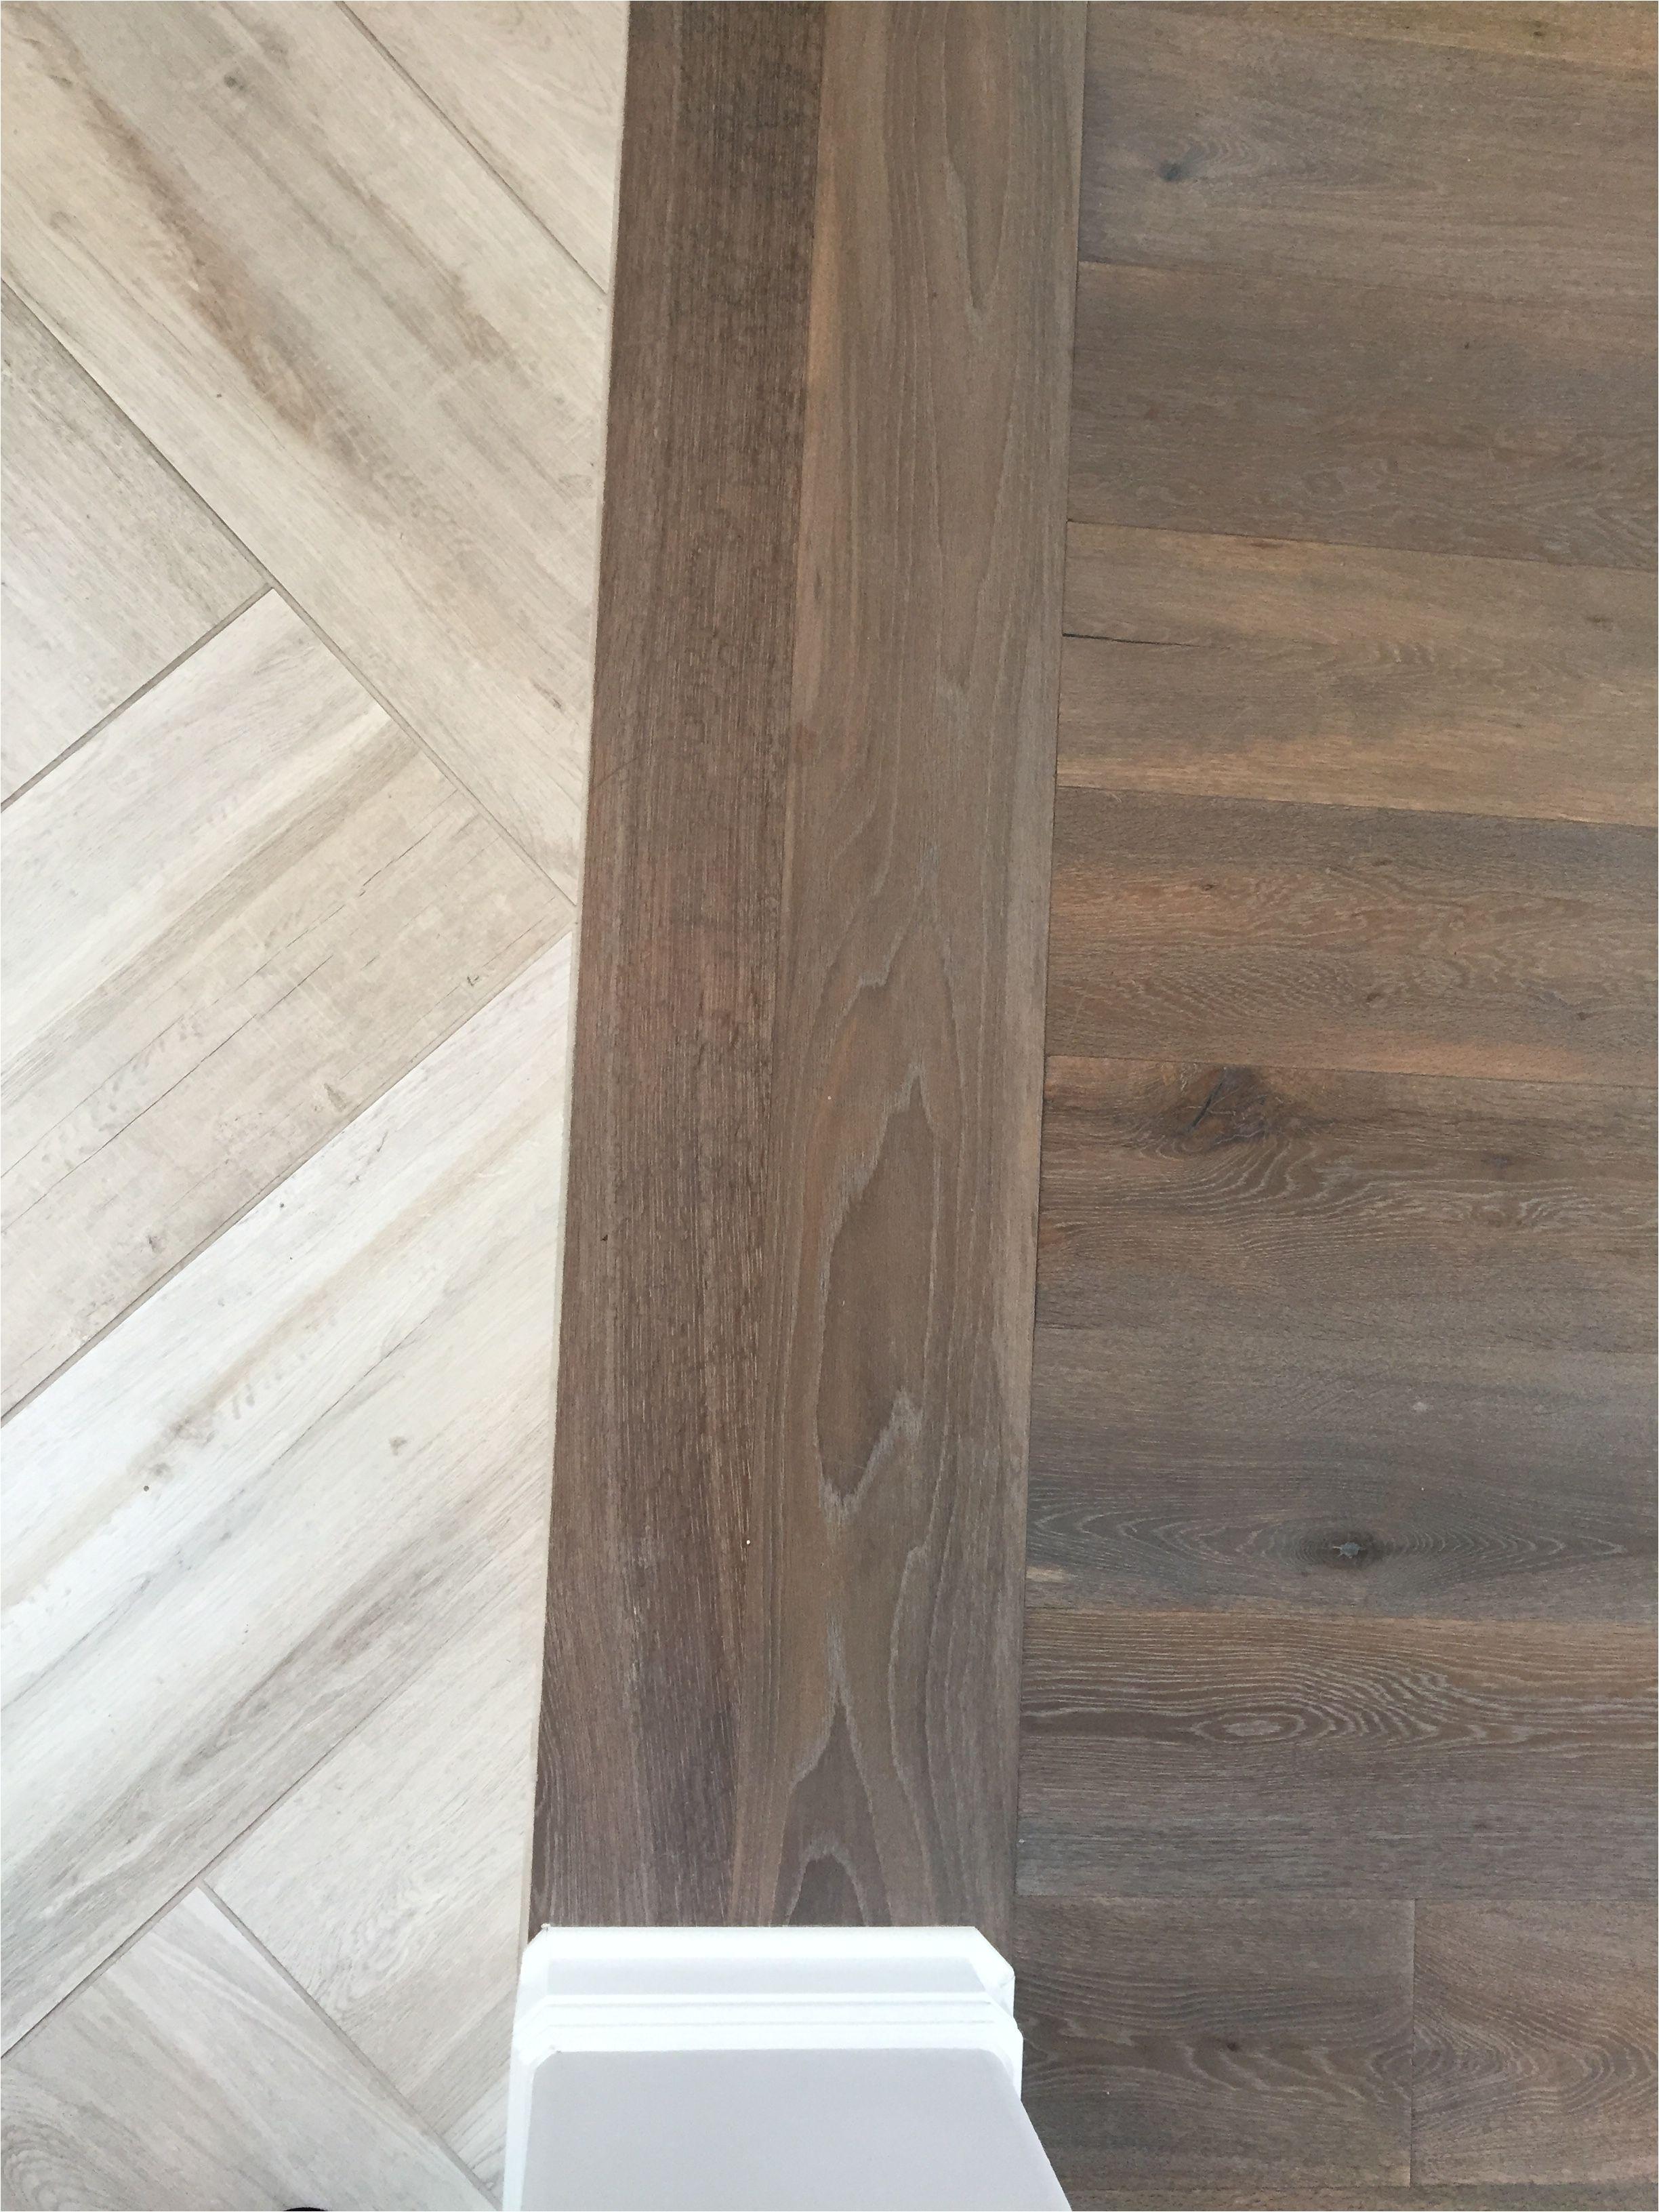 Vinyl Plank Flooring Installation Patterns Floor Transition Laminate To Herringbone Tile Pattern Model